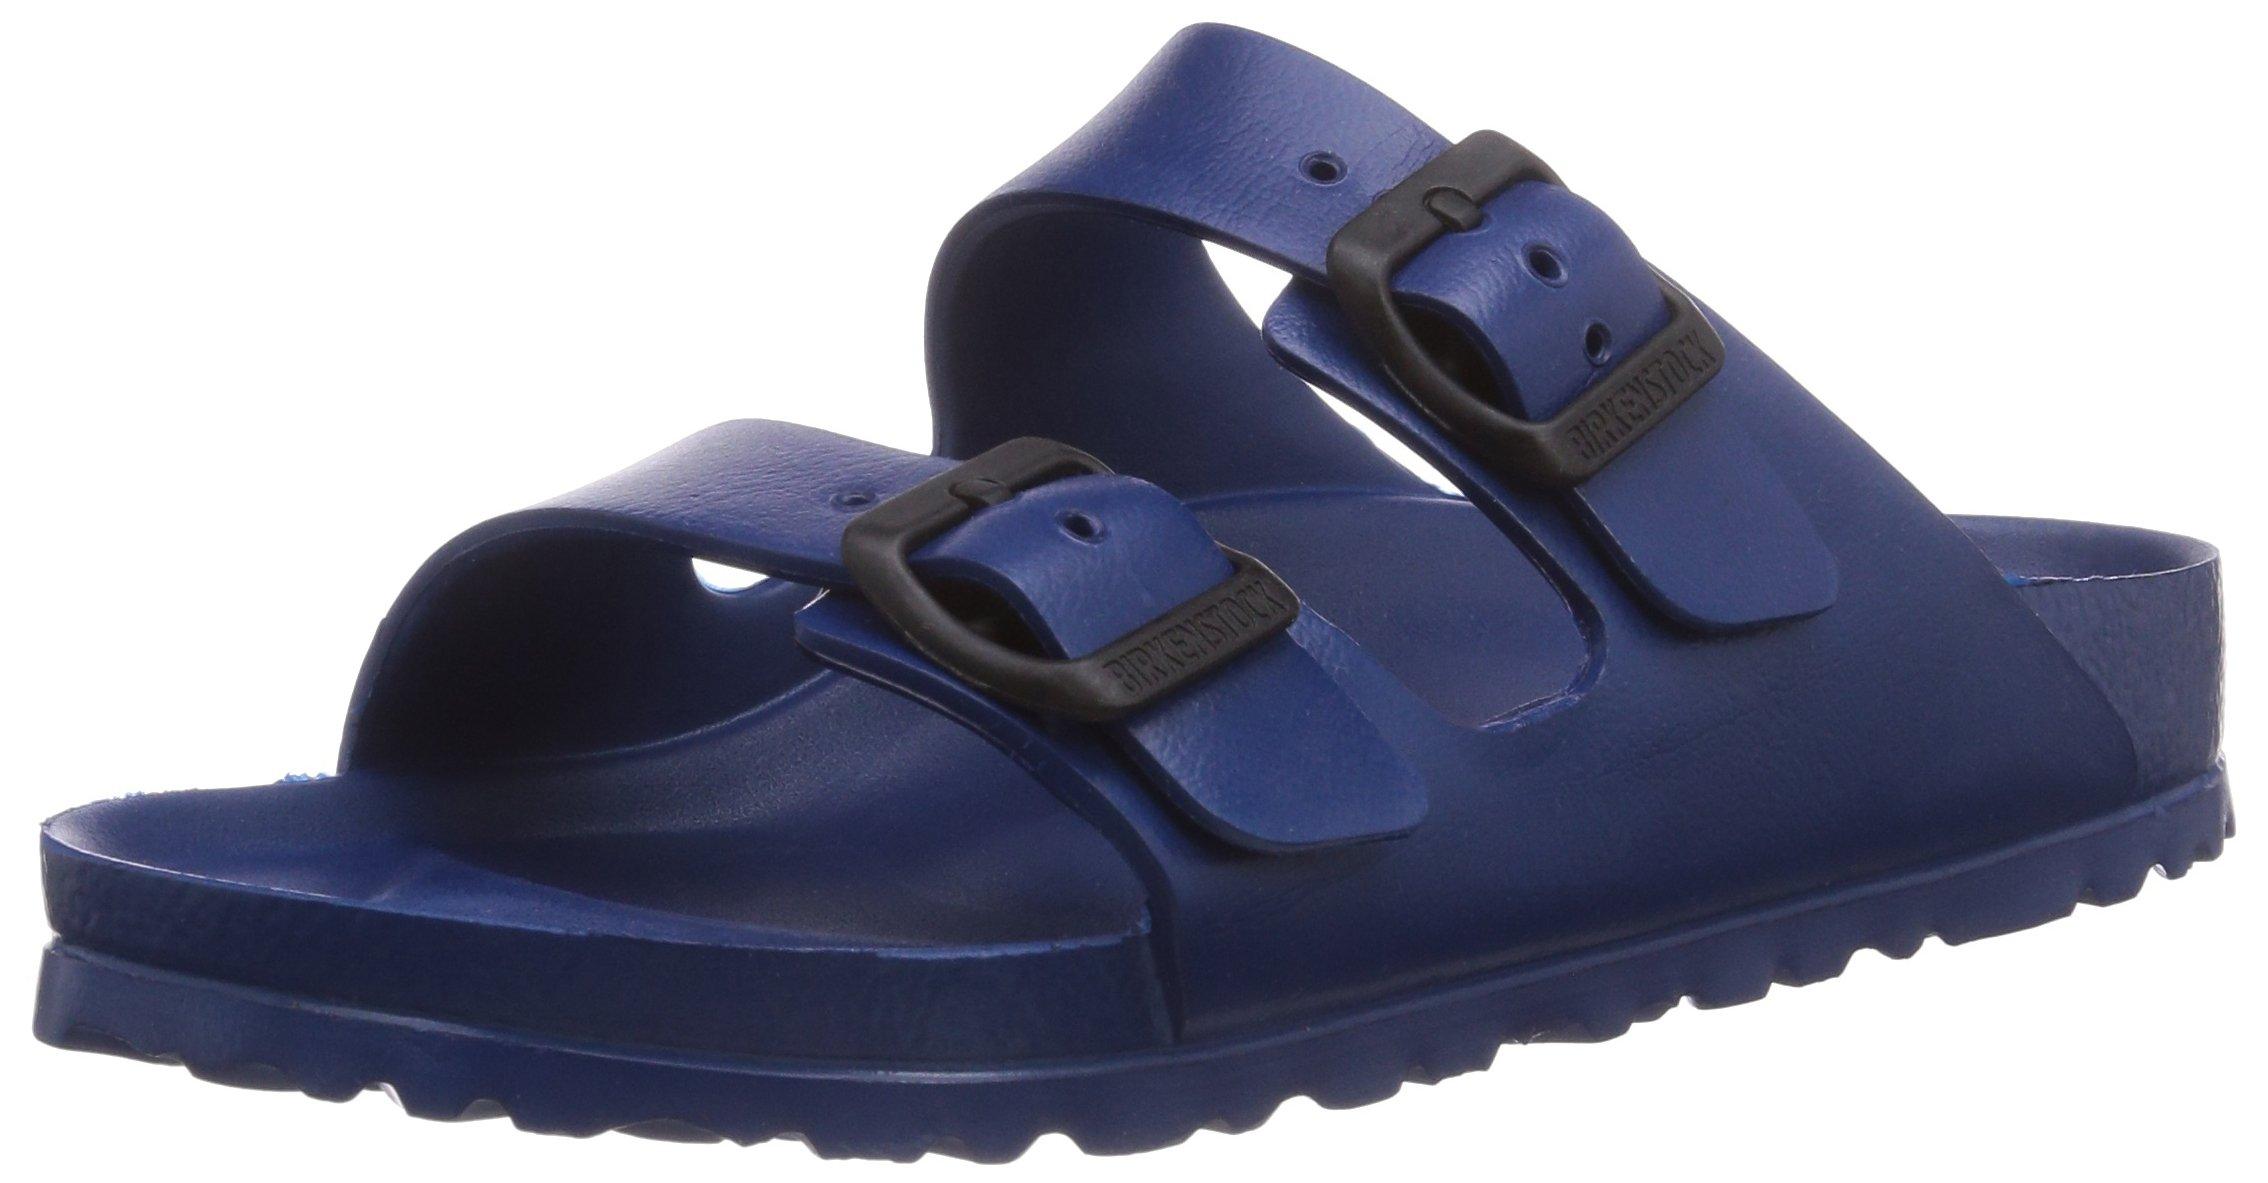 Birkenstock Unisex Arizona Essentials EVA Navy Sandals - 41 EU Narrow